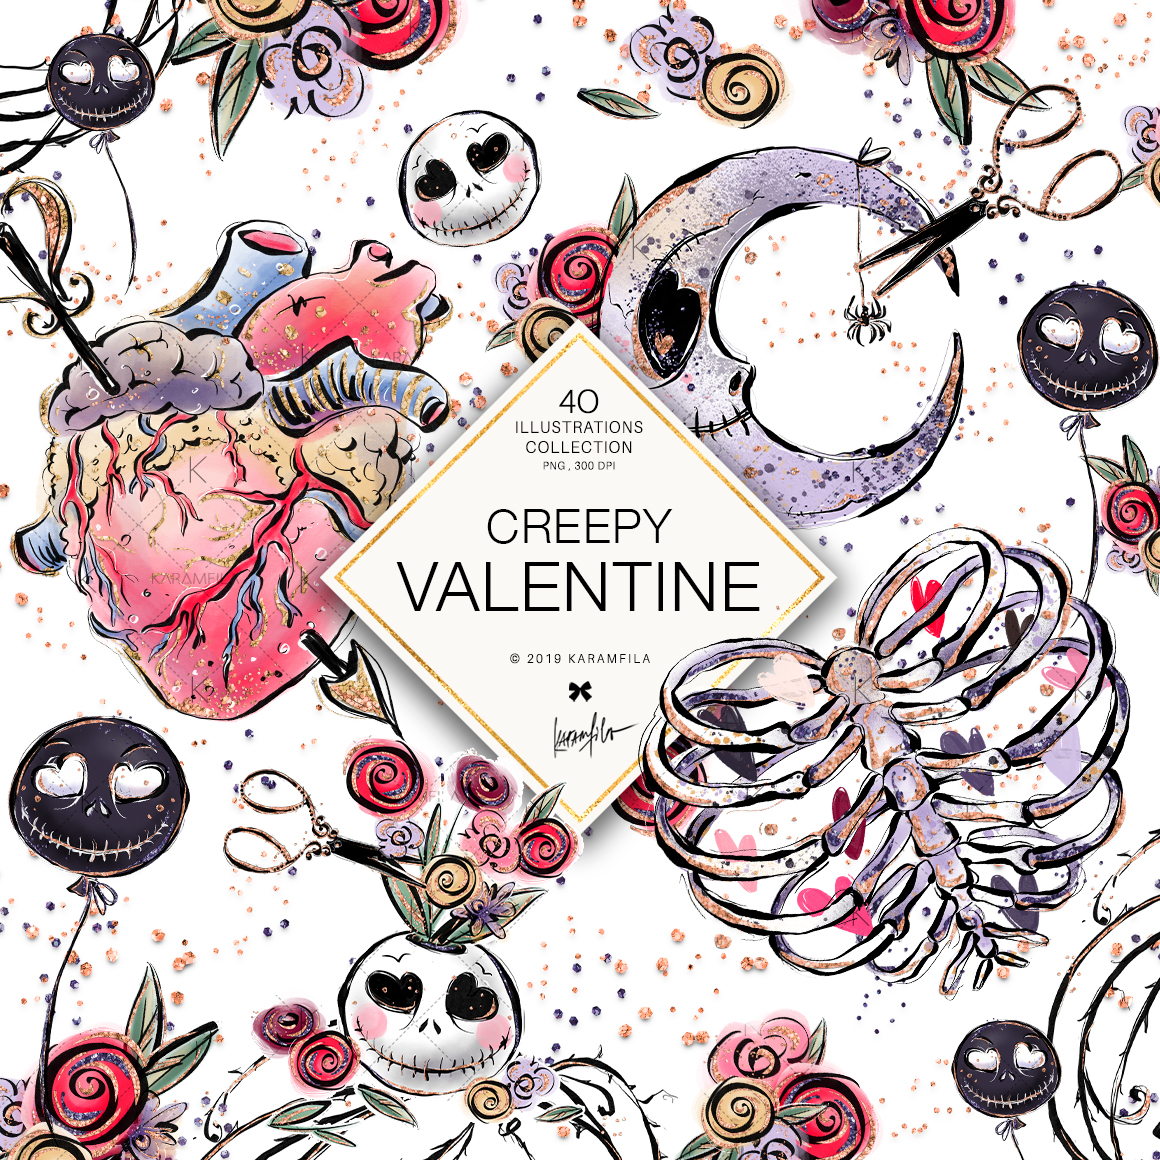 Creepy Valentine's Day Clipart example image 3